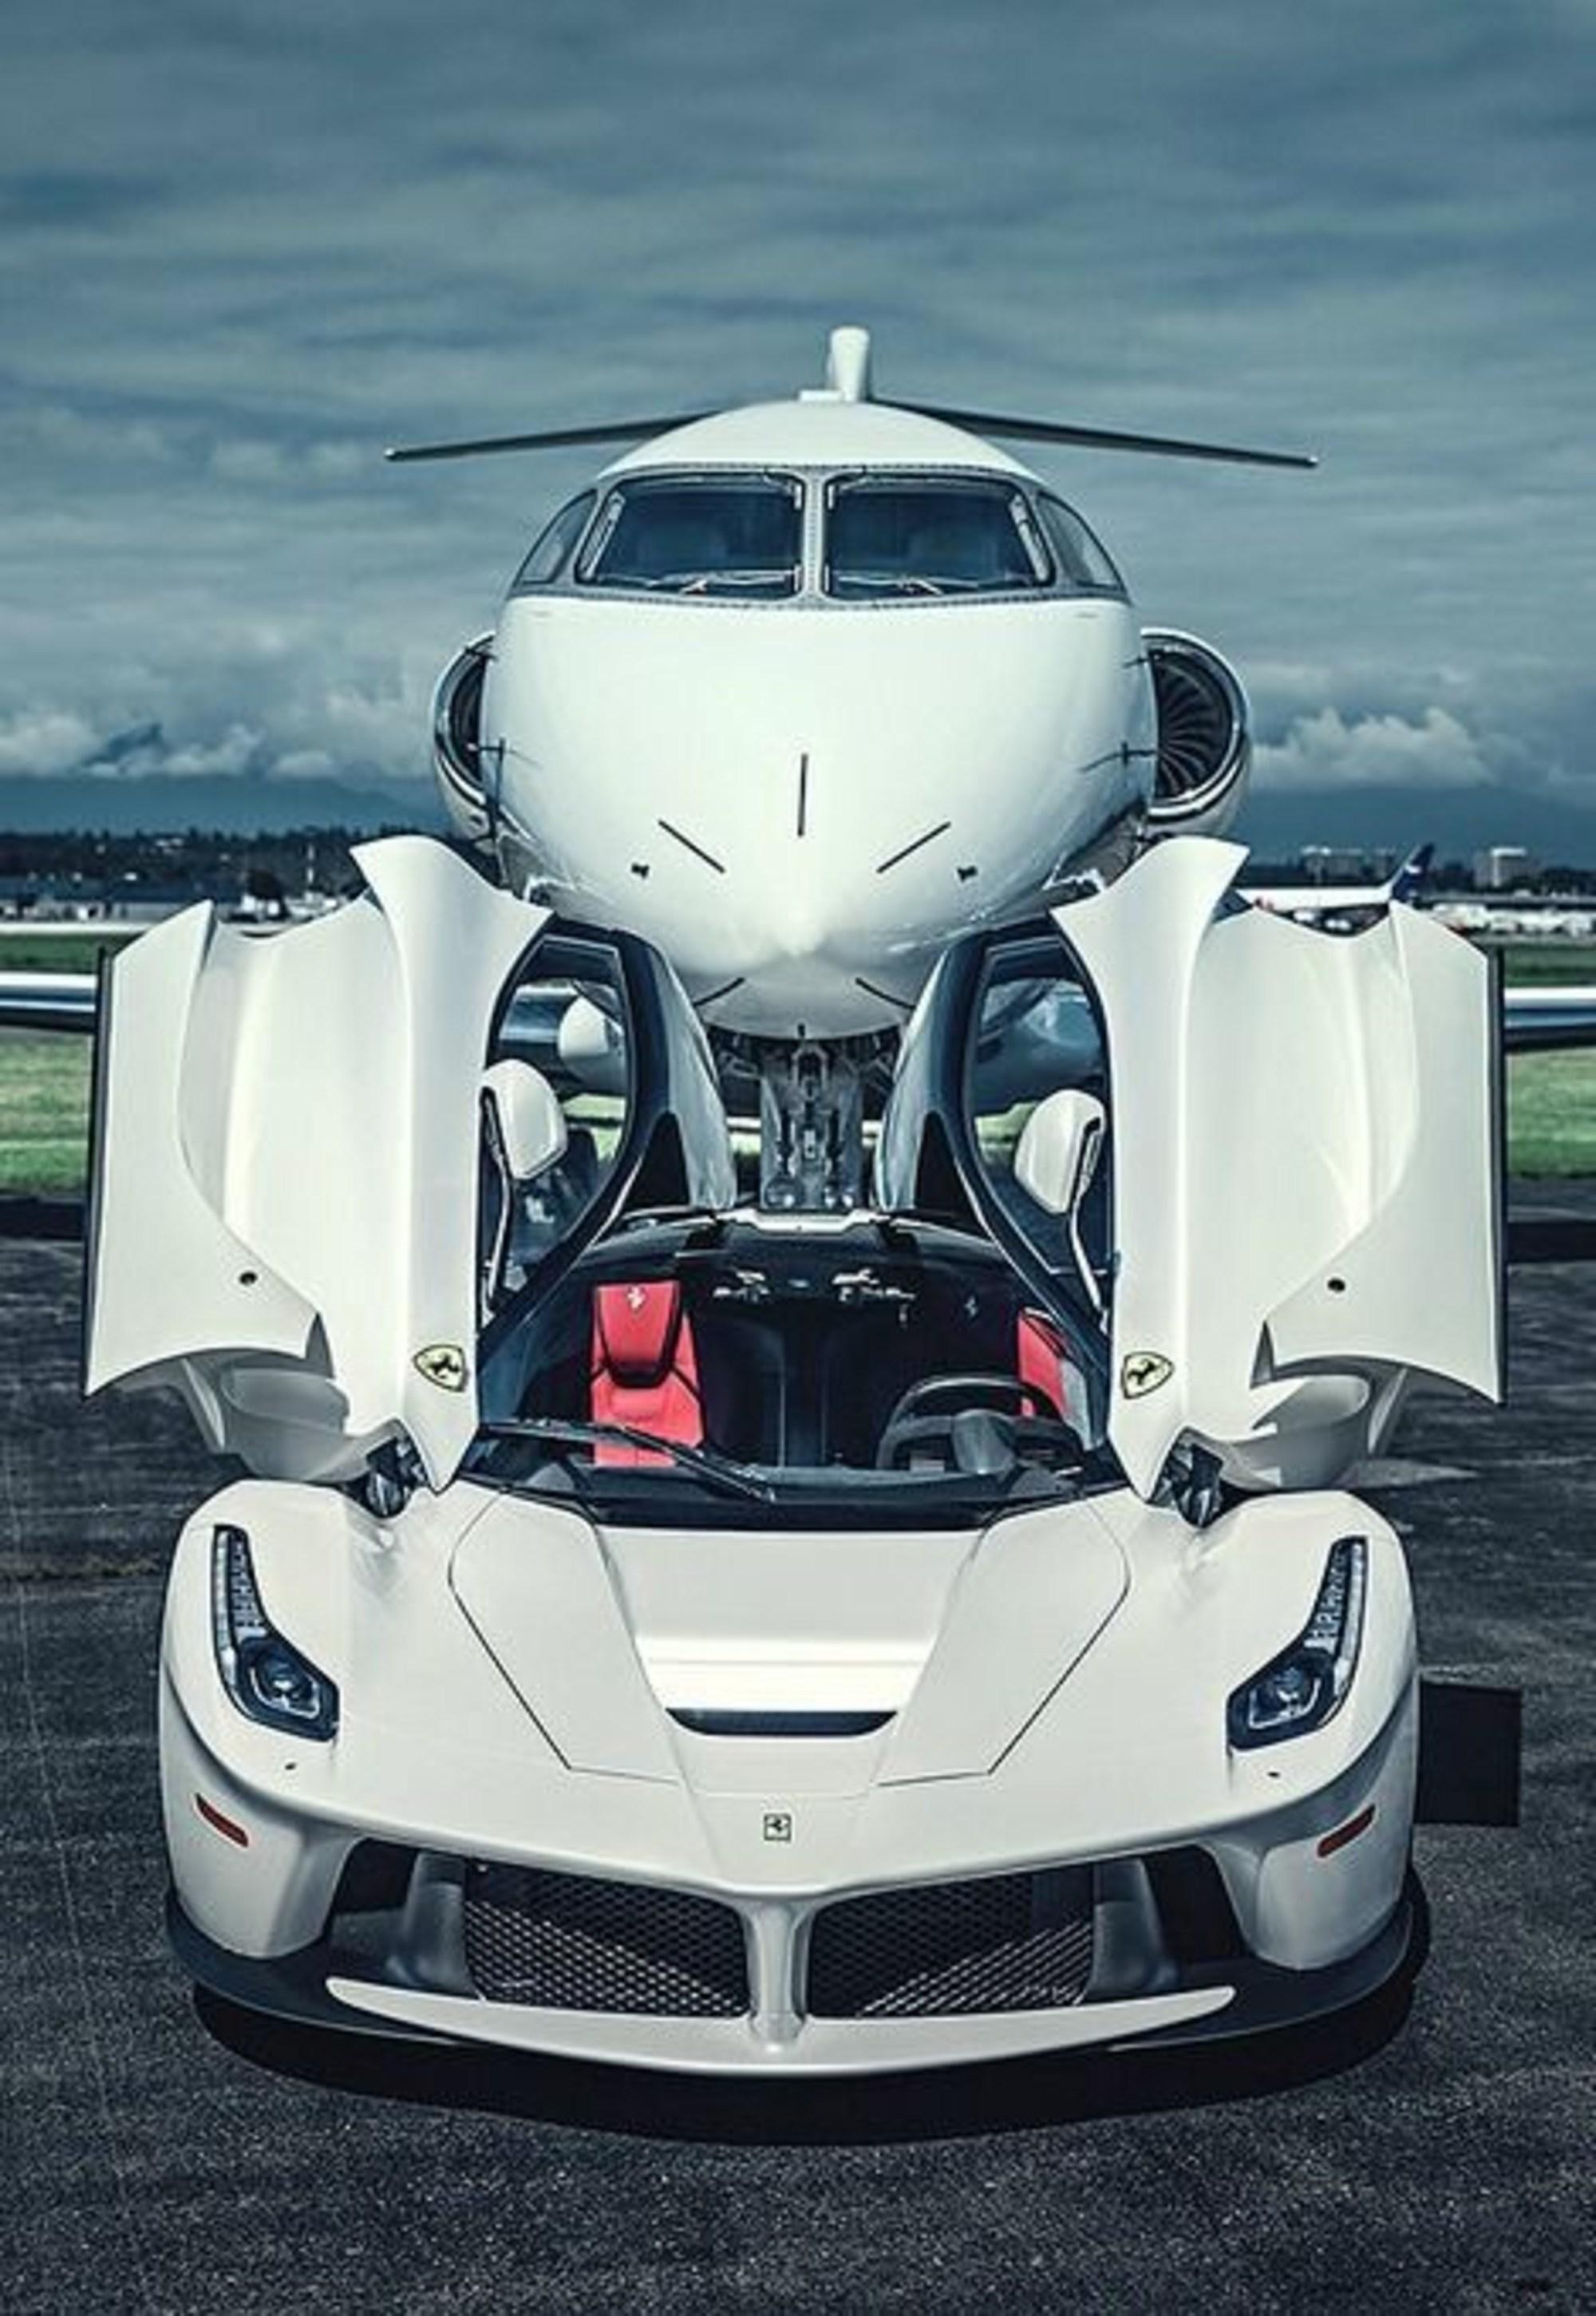 White Ferrari Laferrari And Private Airline By Rogue Rattlesnake On Deviantart